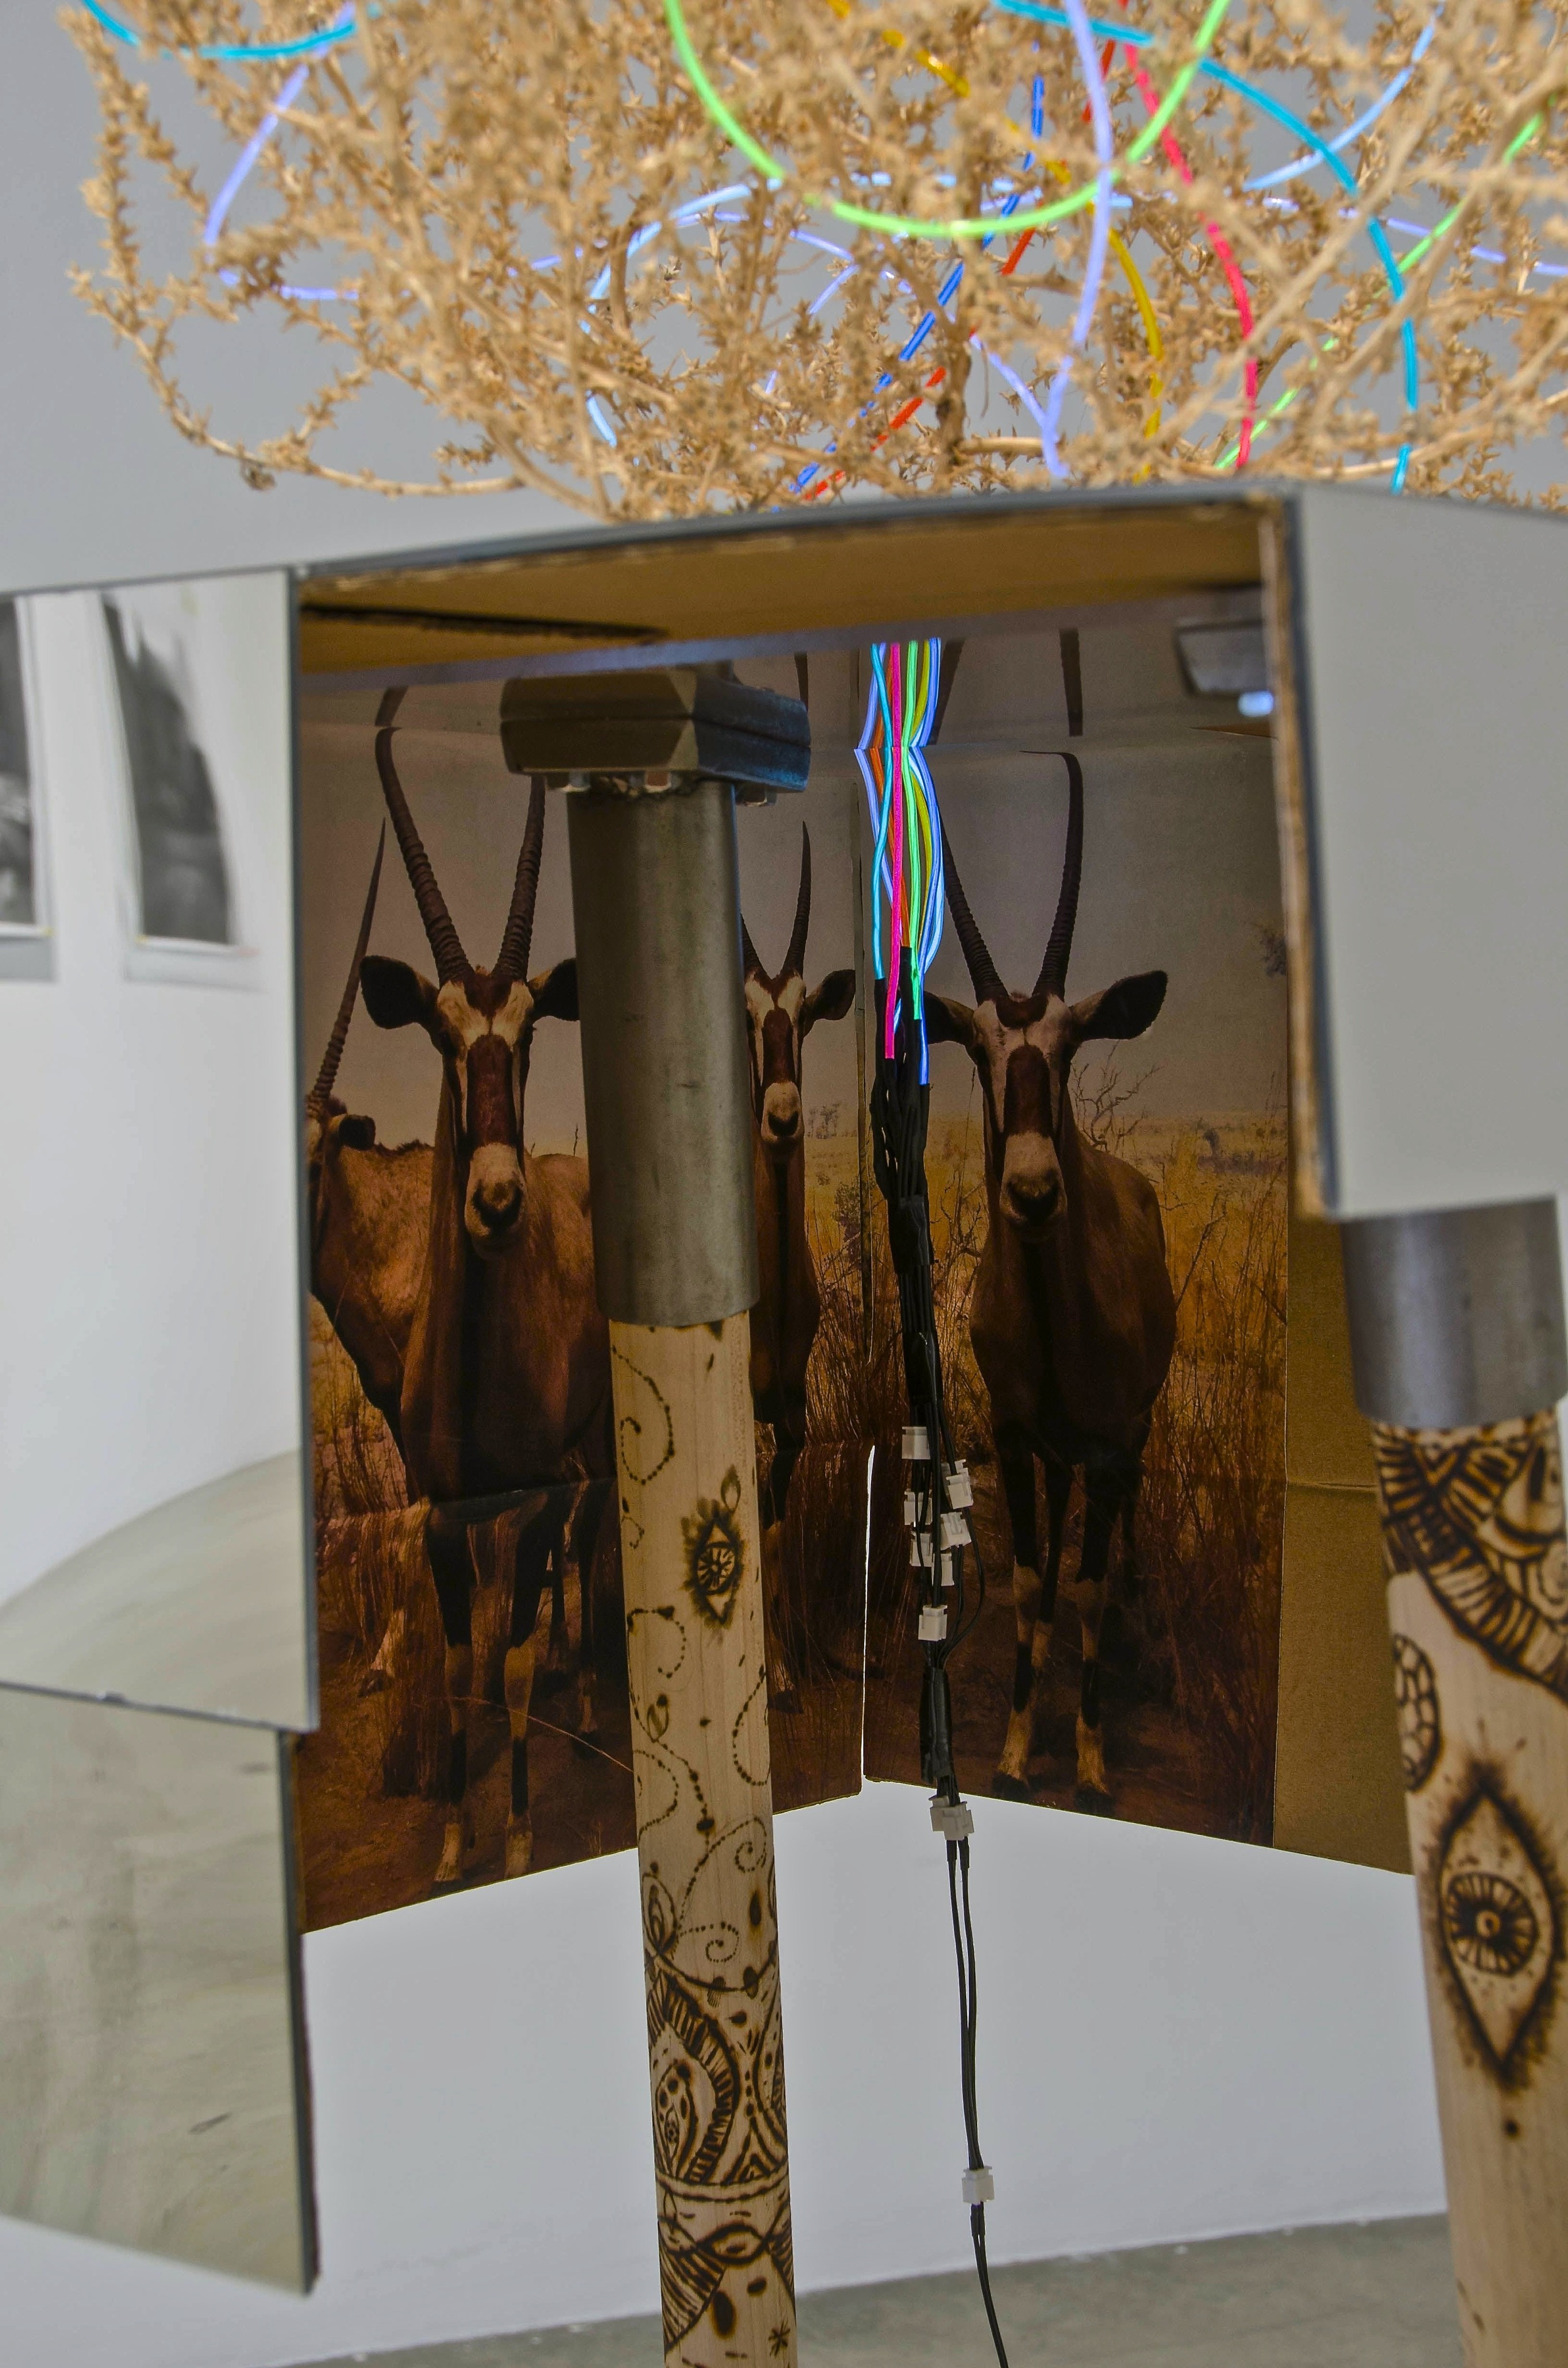 close-up, wood (wood burned), steel, cardboard, photograph, mirrored plexiglas, tumbleweed, EL wire